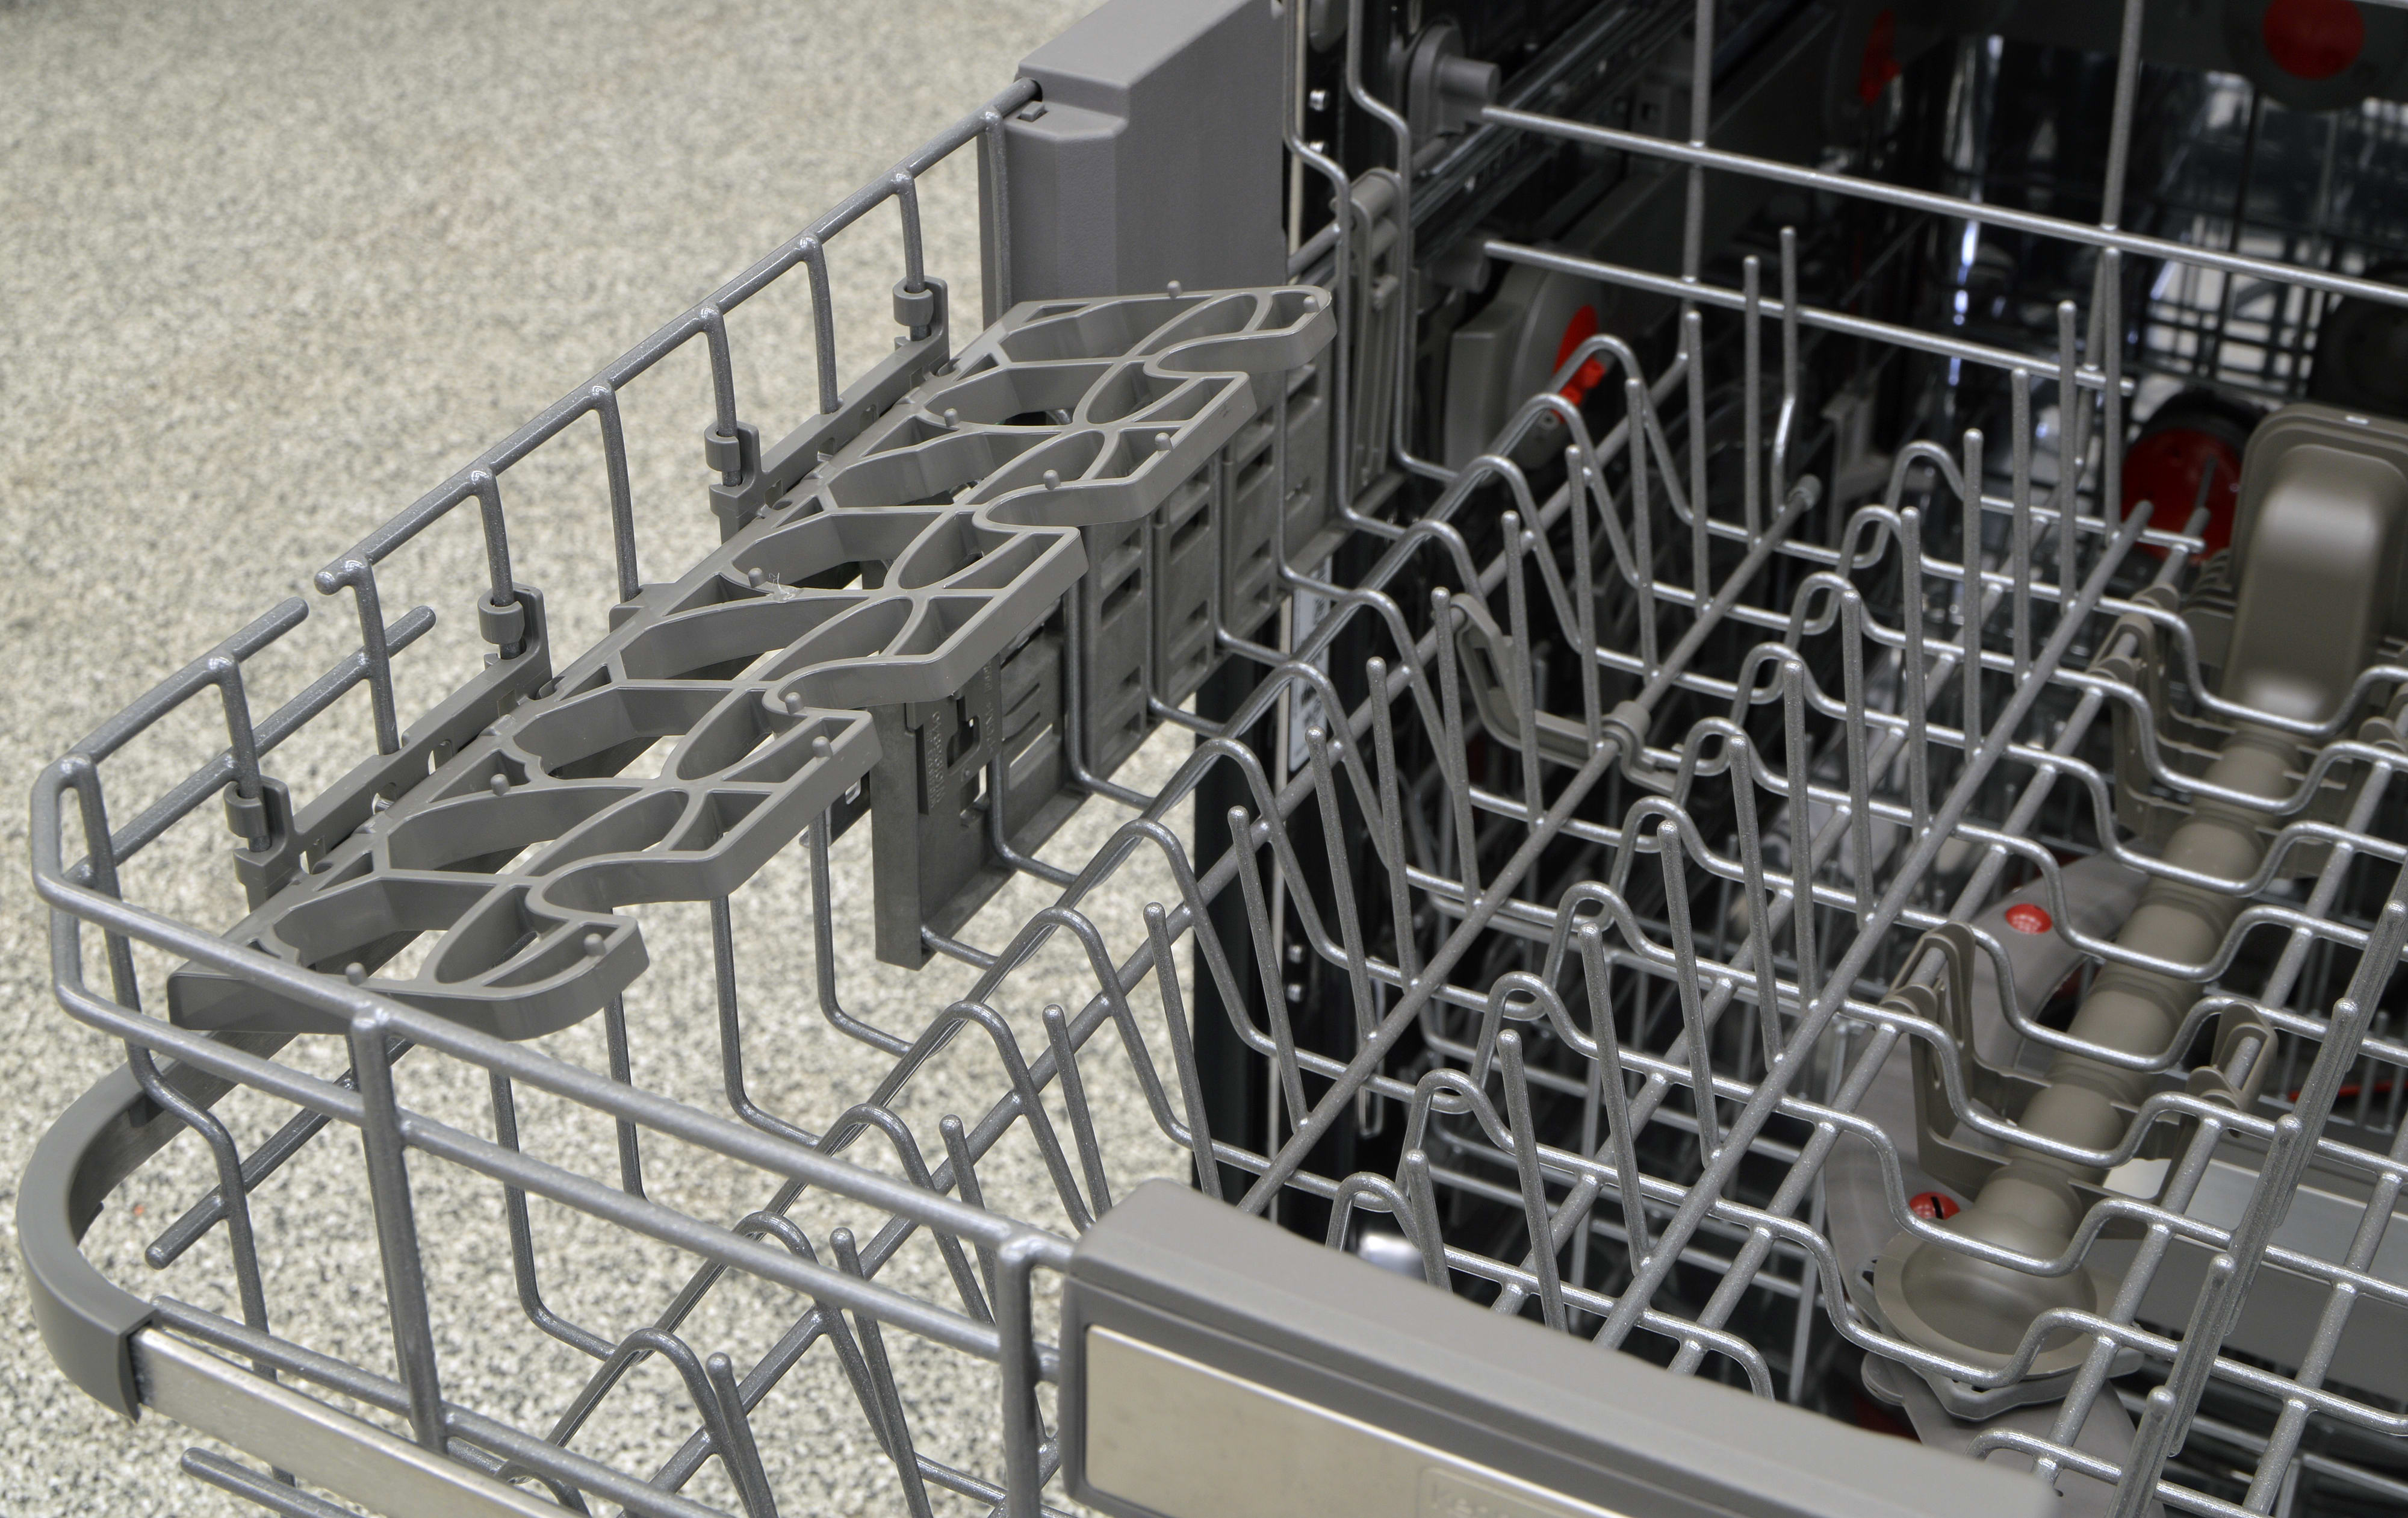 A simple fold-down shelf on the upper rack